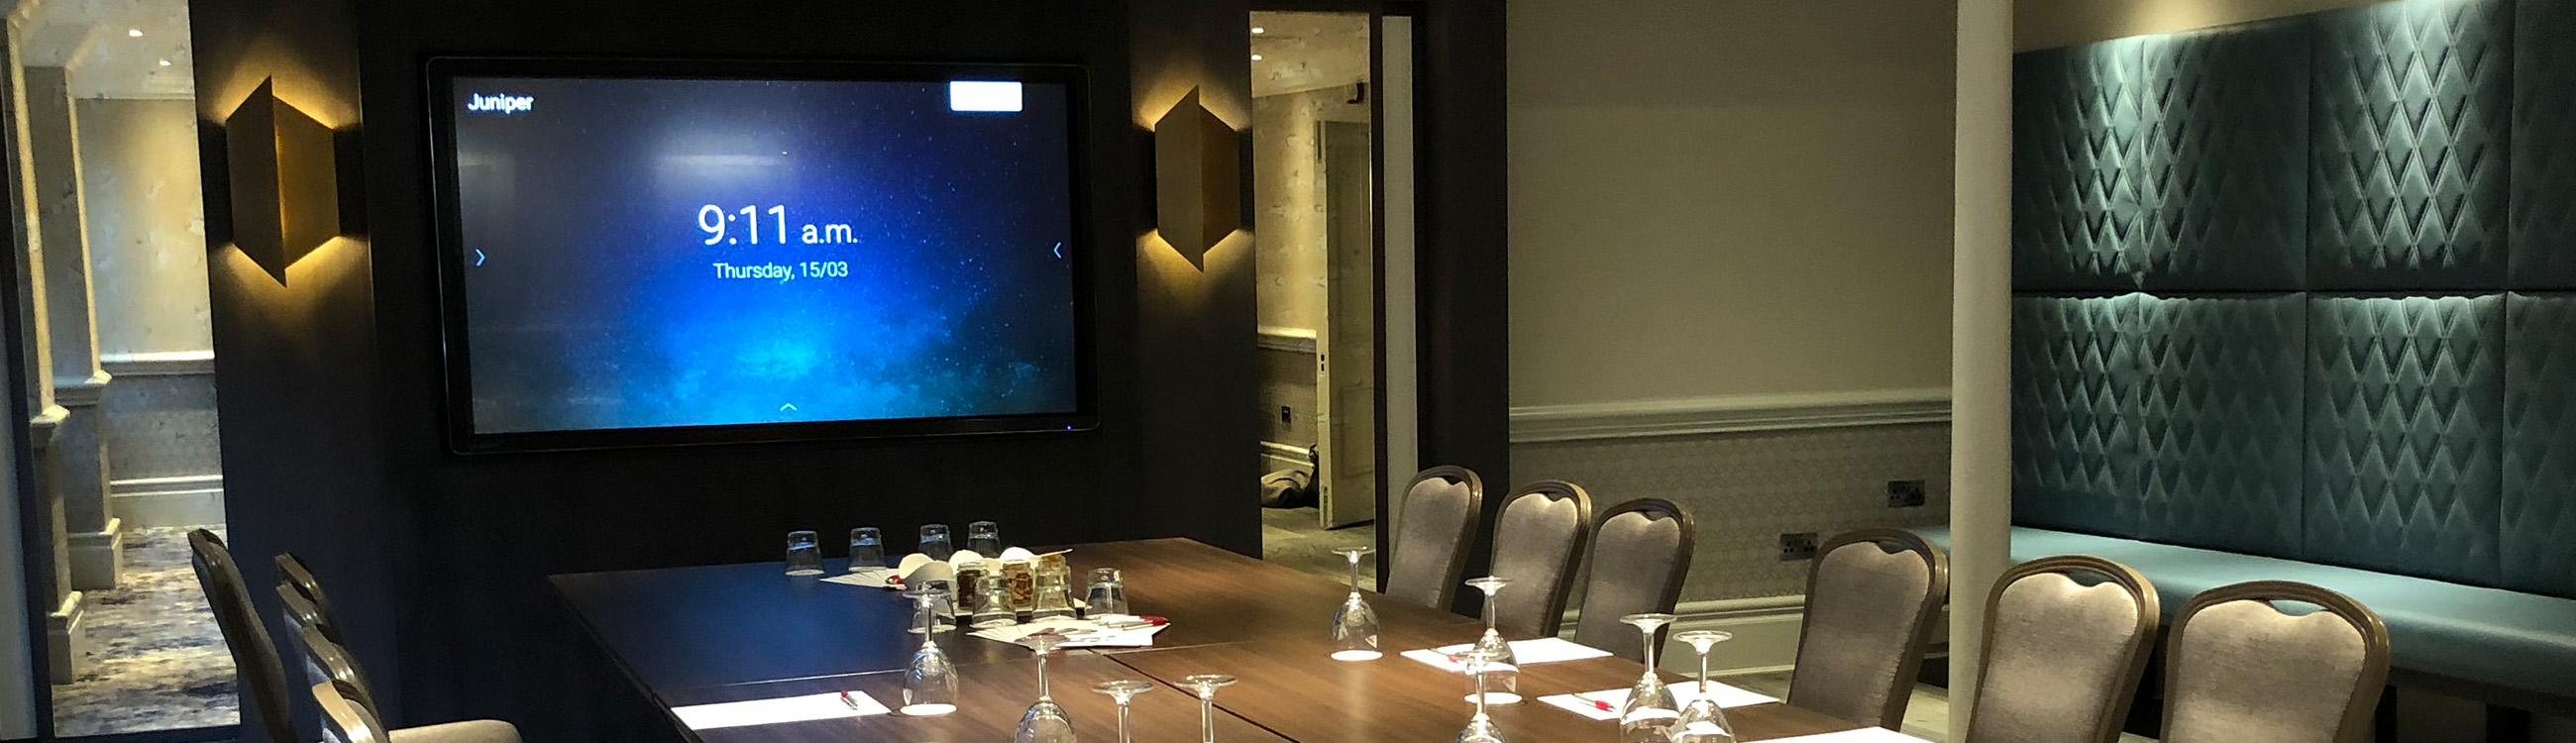 ecran interactif clevertouch hotel hanbury